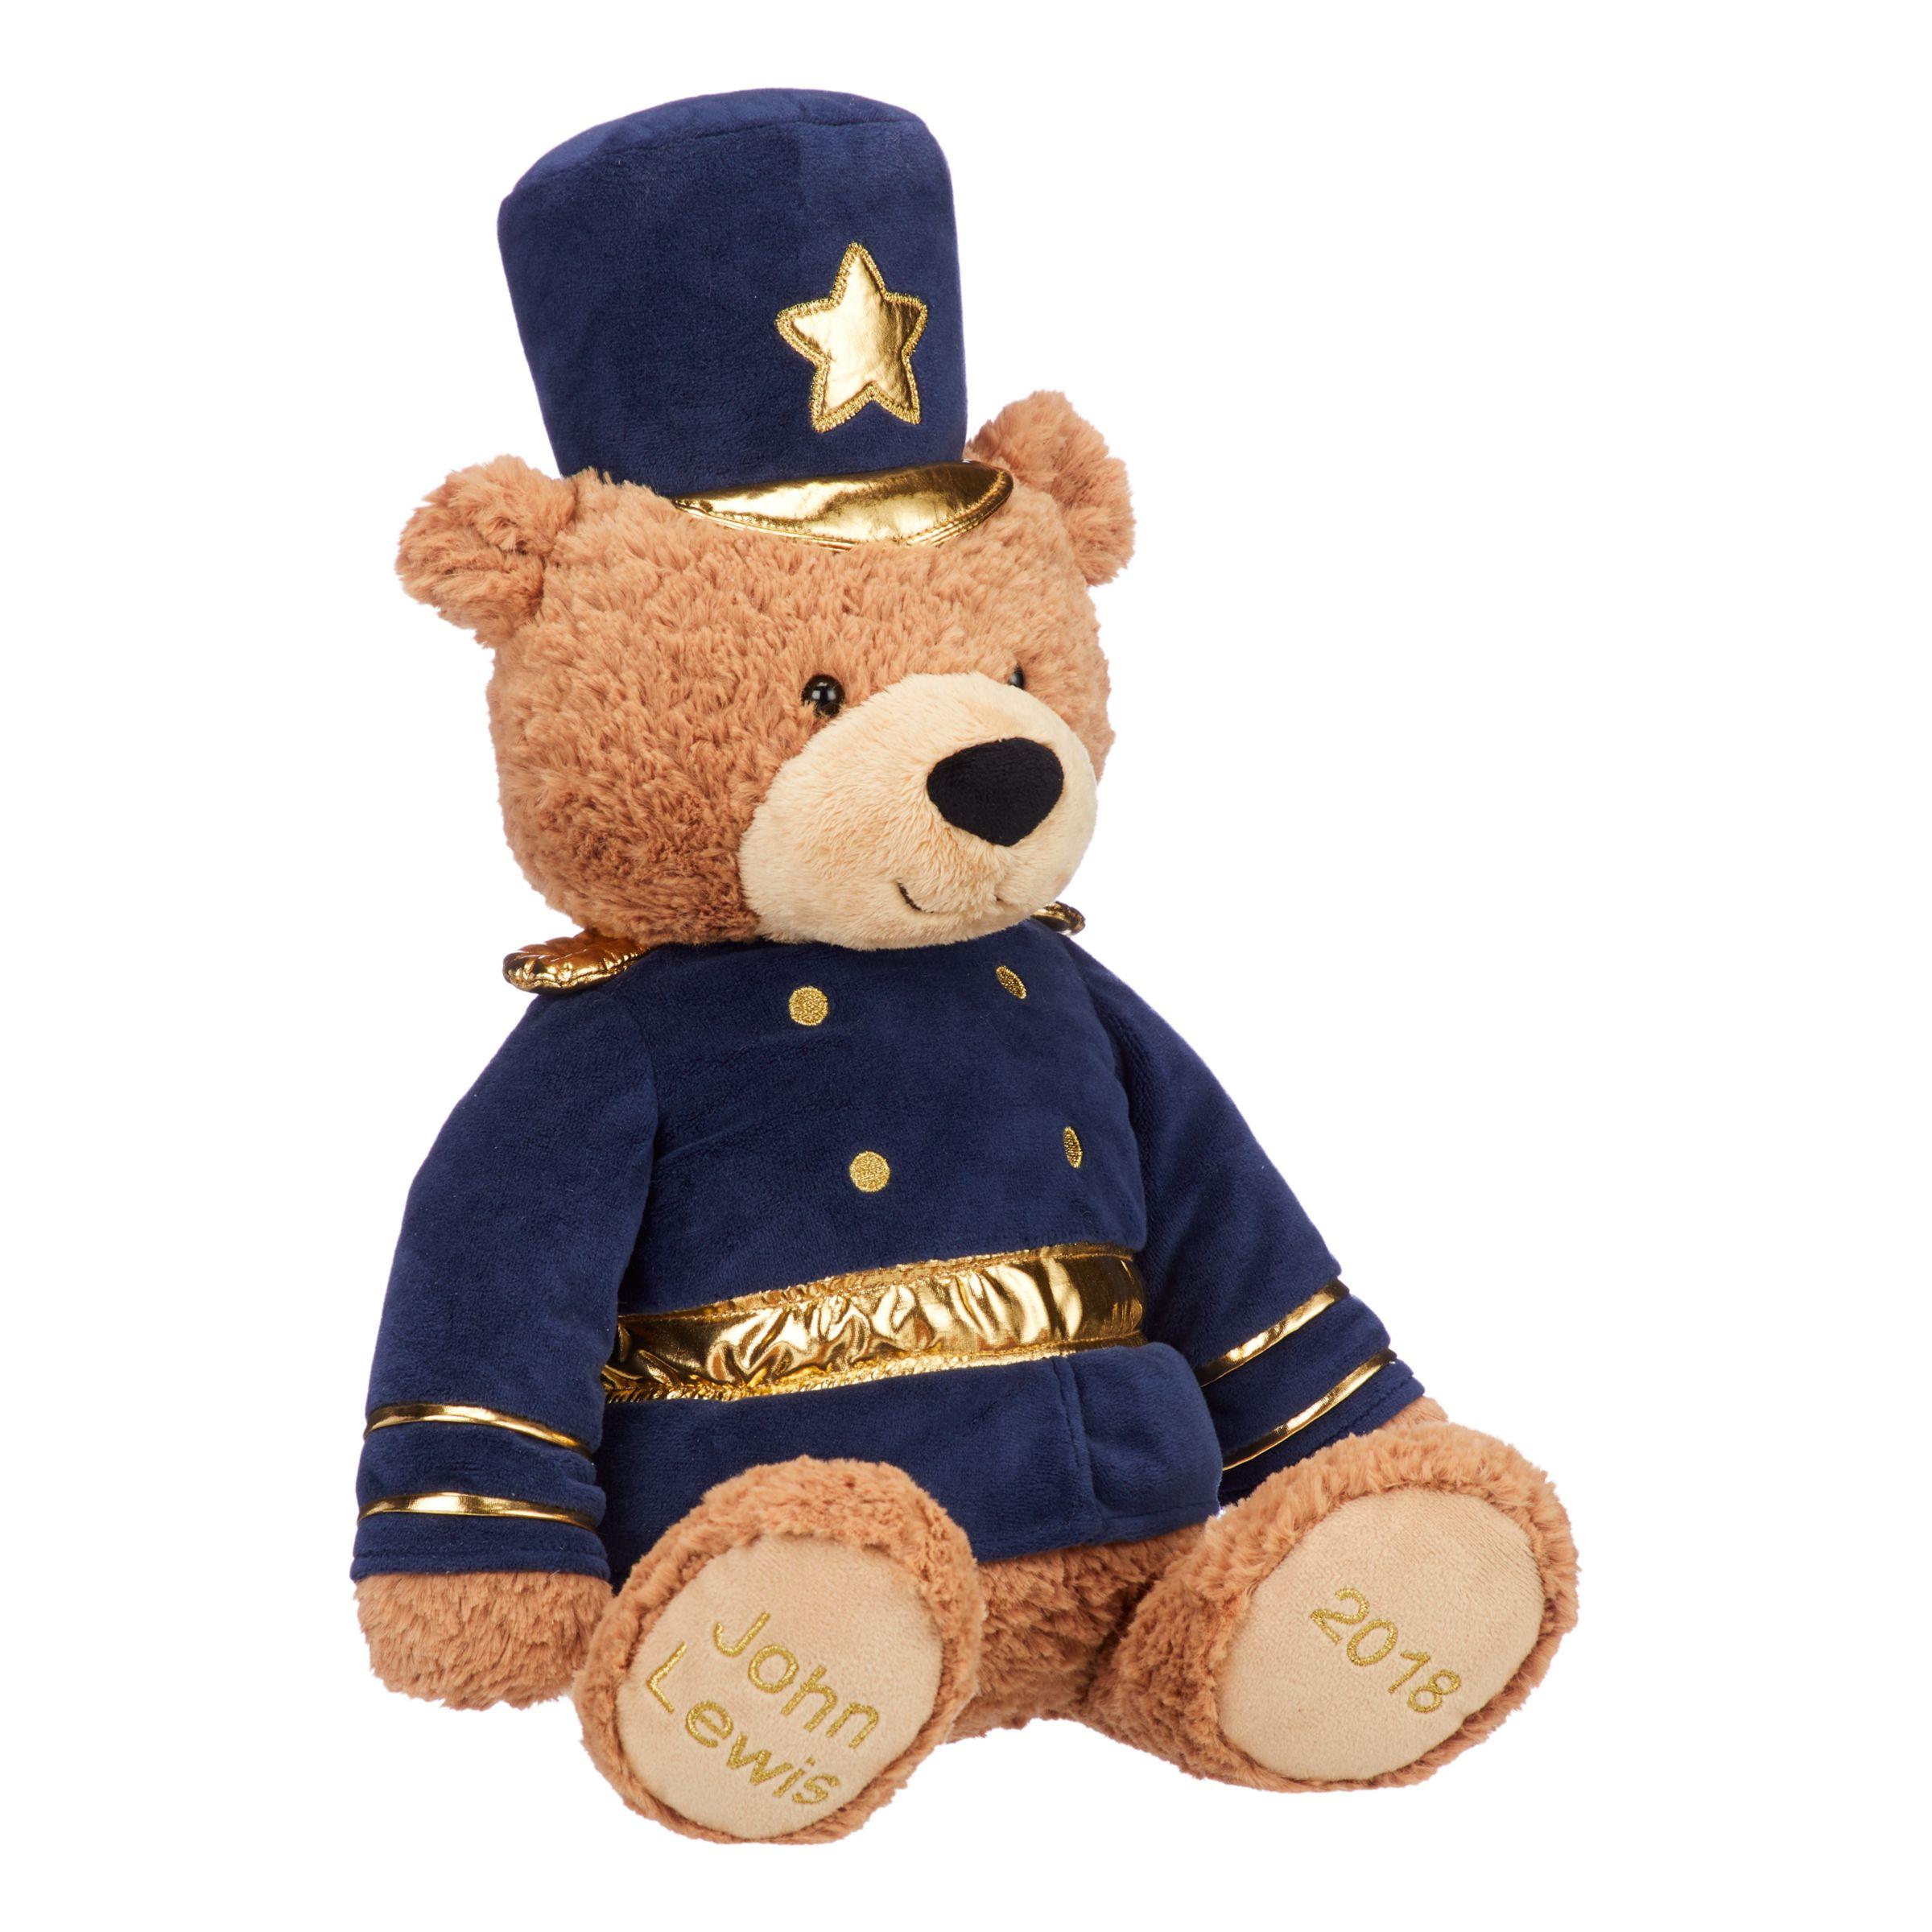 1afd451254b9 John Lewis   Partners Nutcracker Lewis Bear 2018 Soft Toy